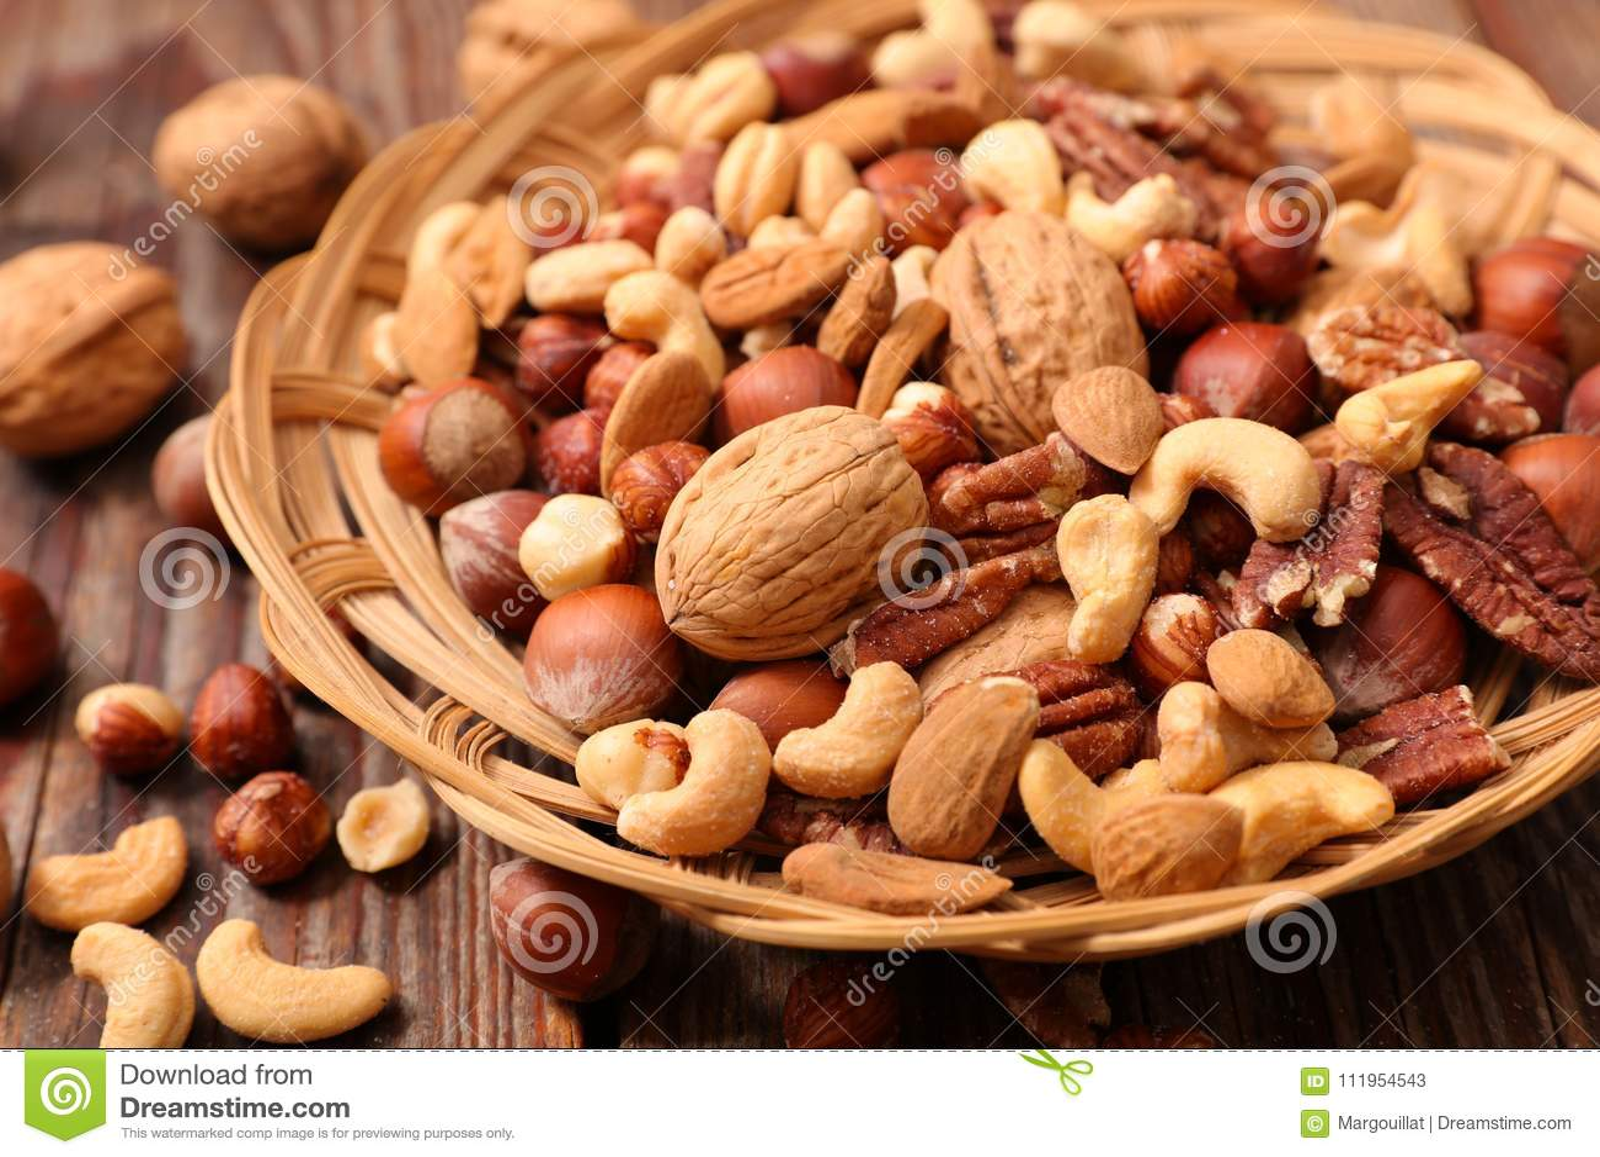 Assorted nut fruit